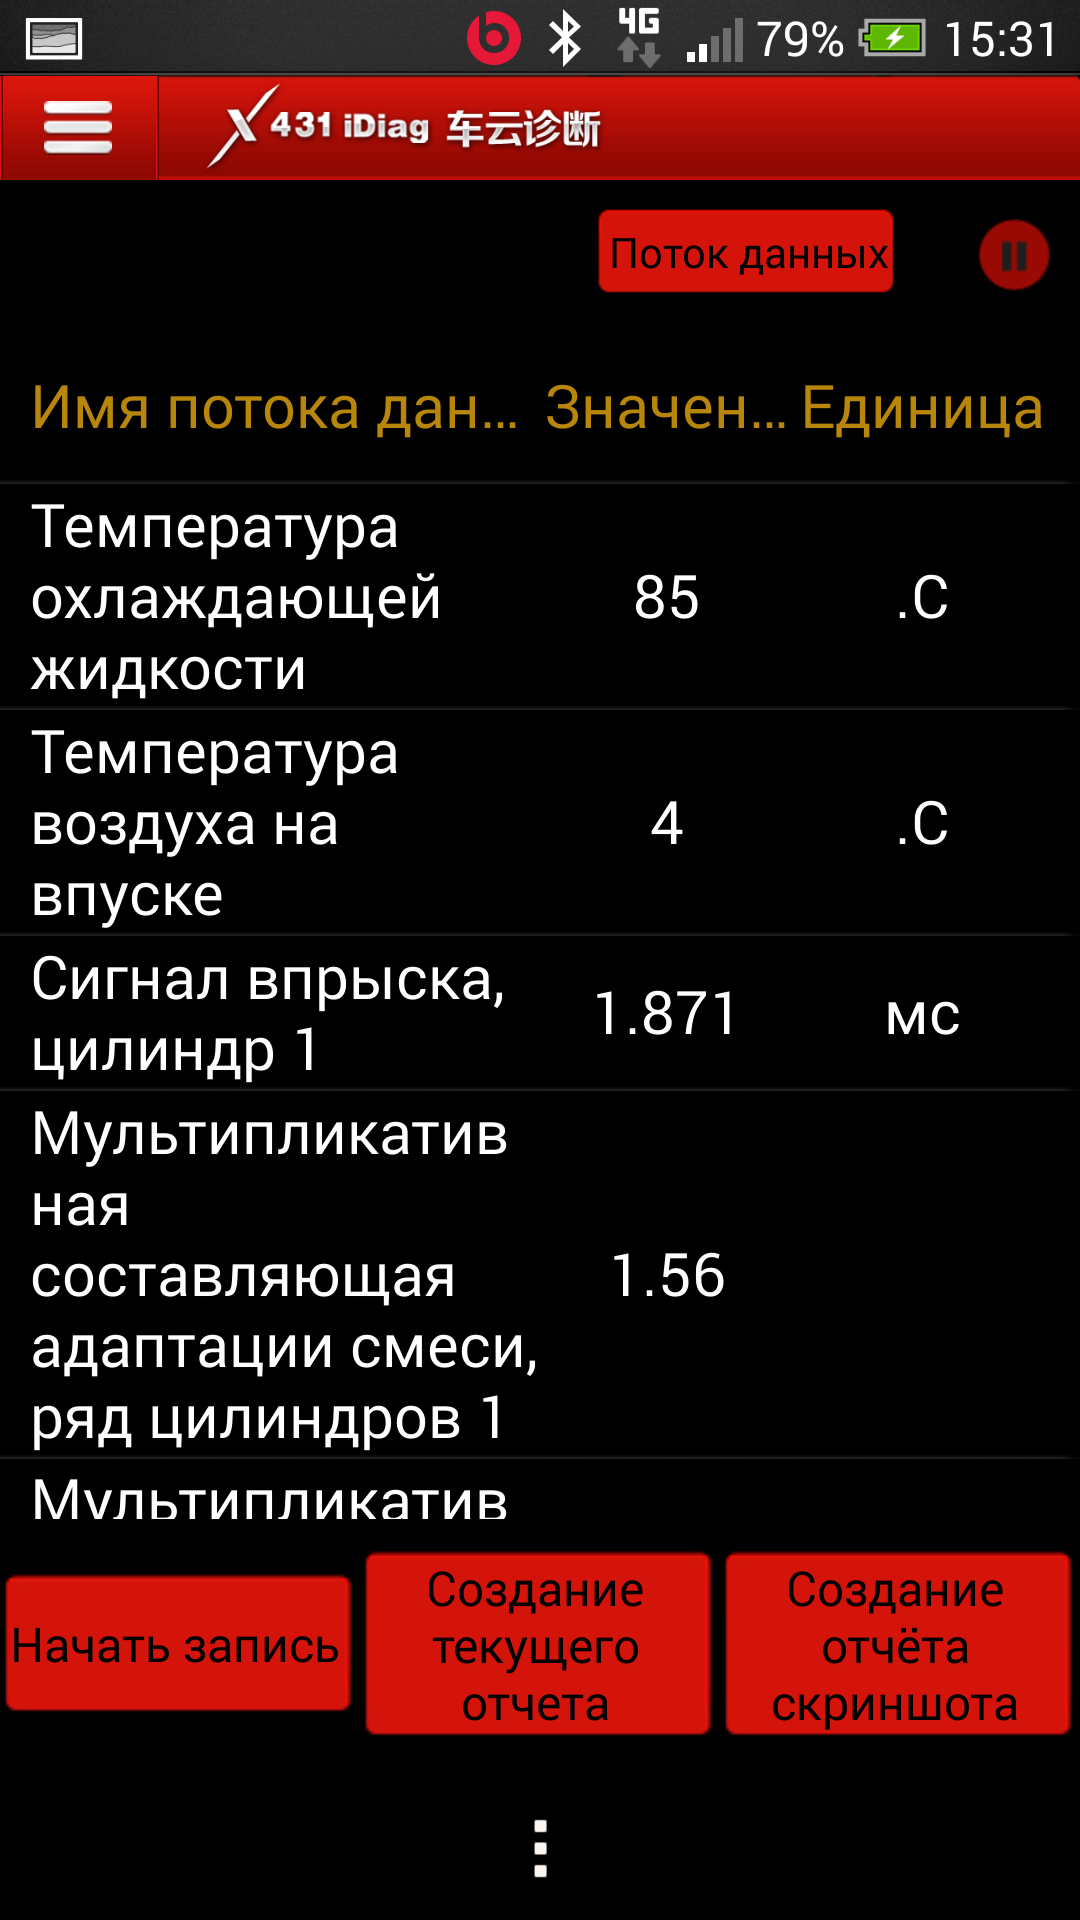 Screenshot_2021-01-16-15-31-04